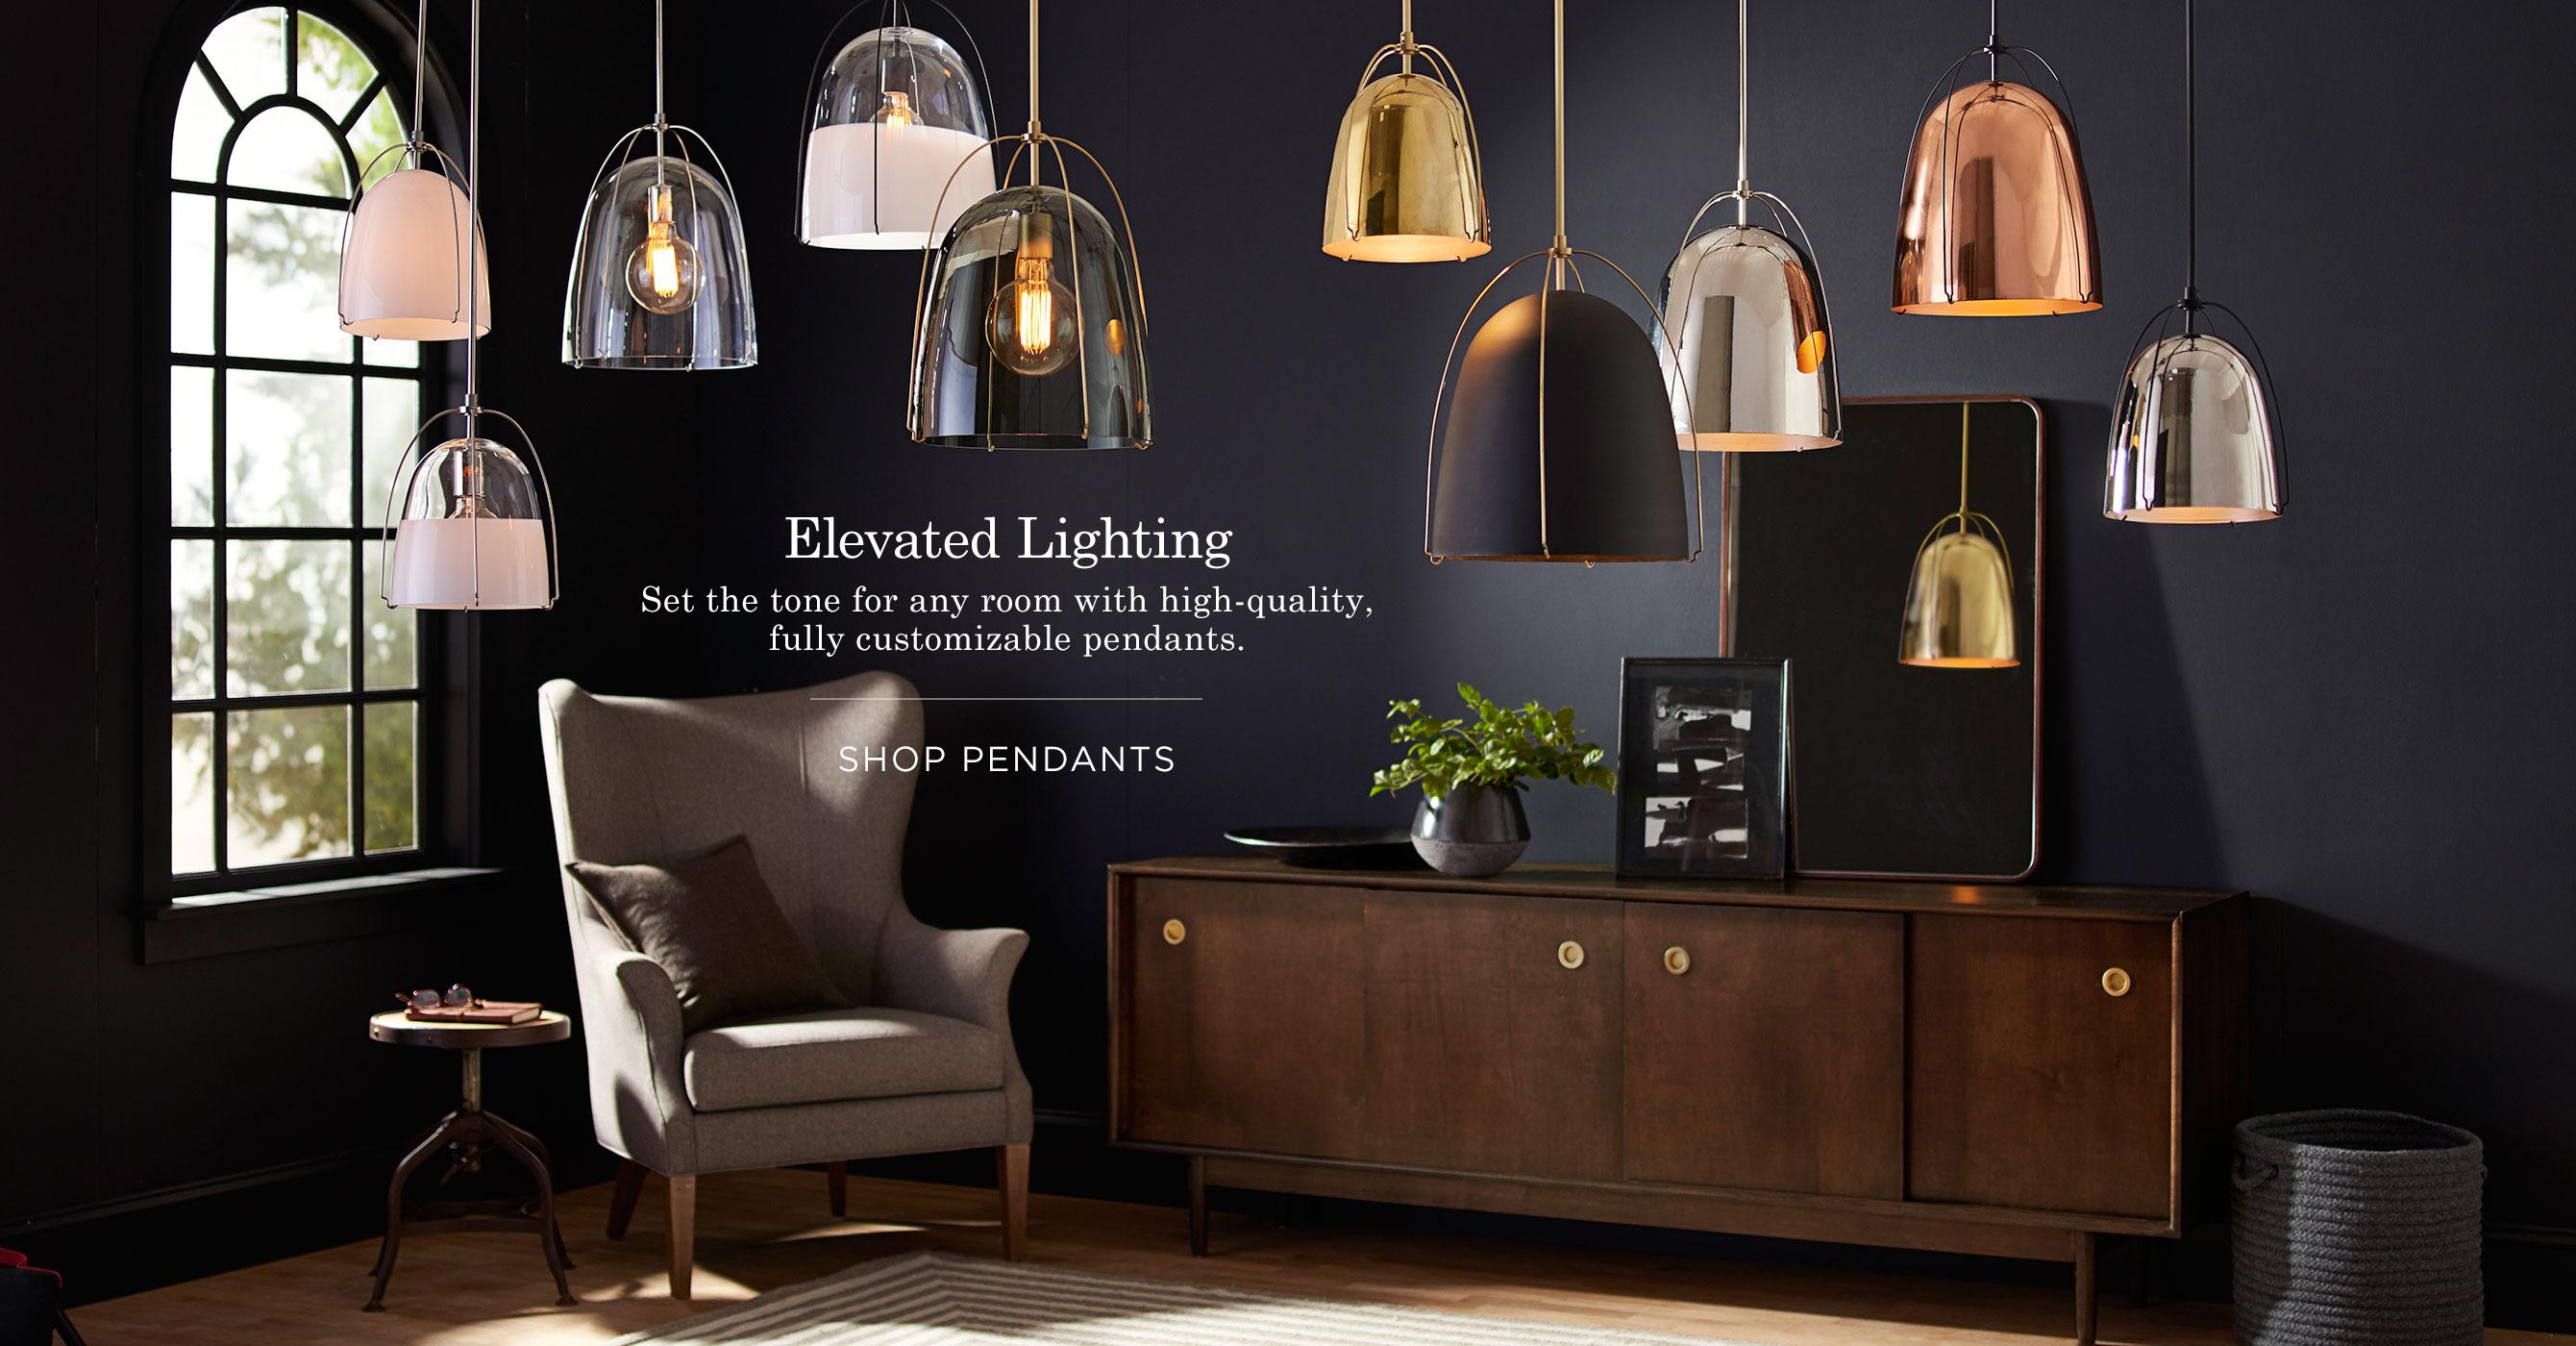 Elevated Lighting